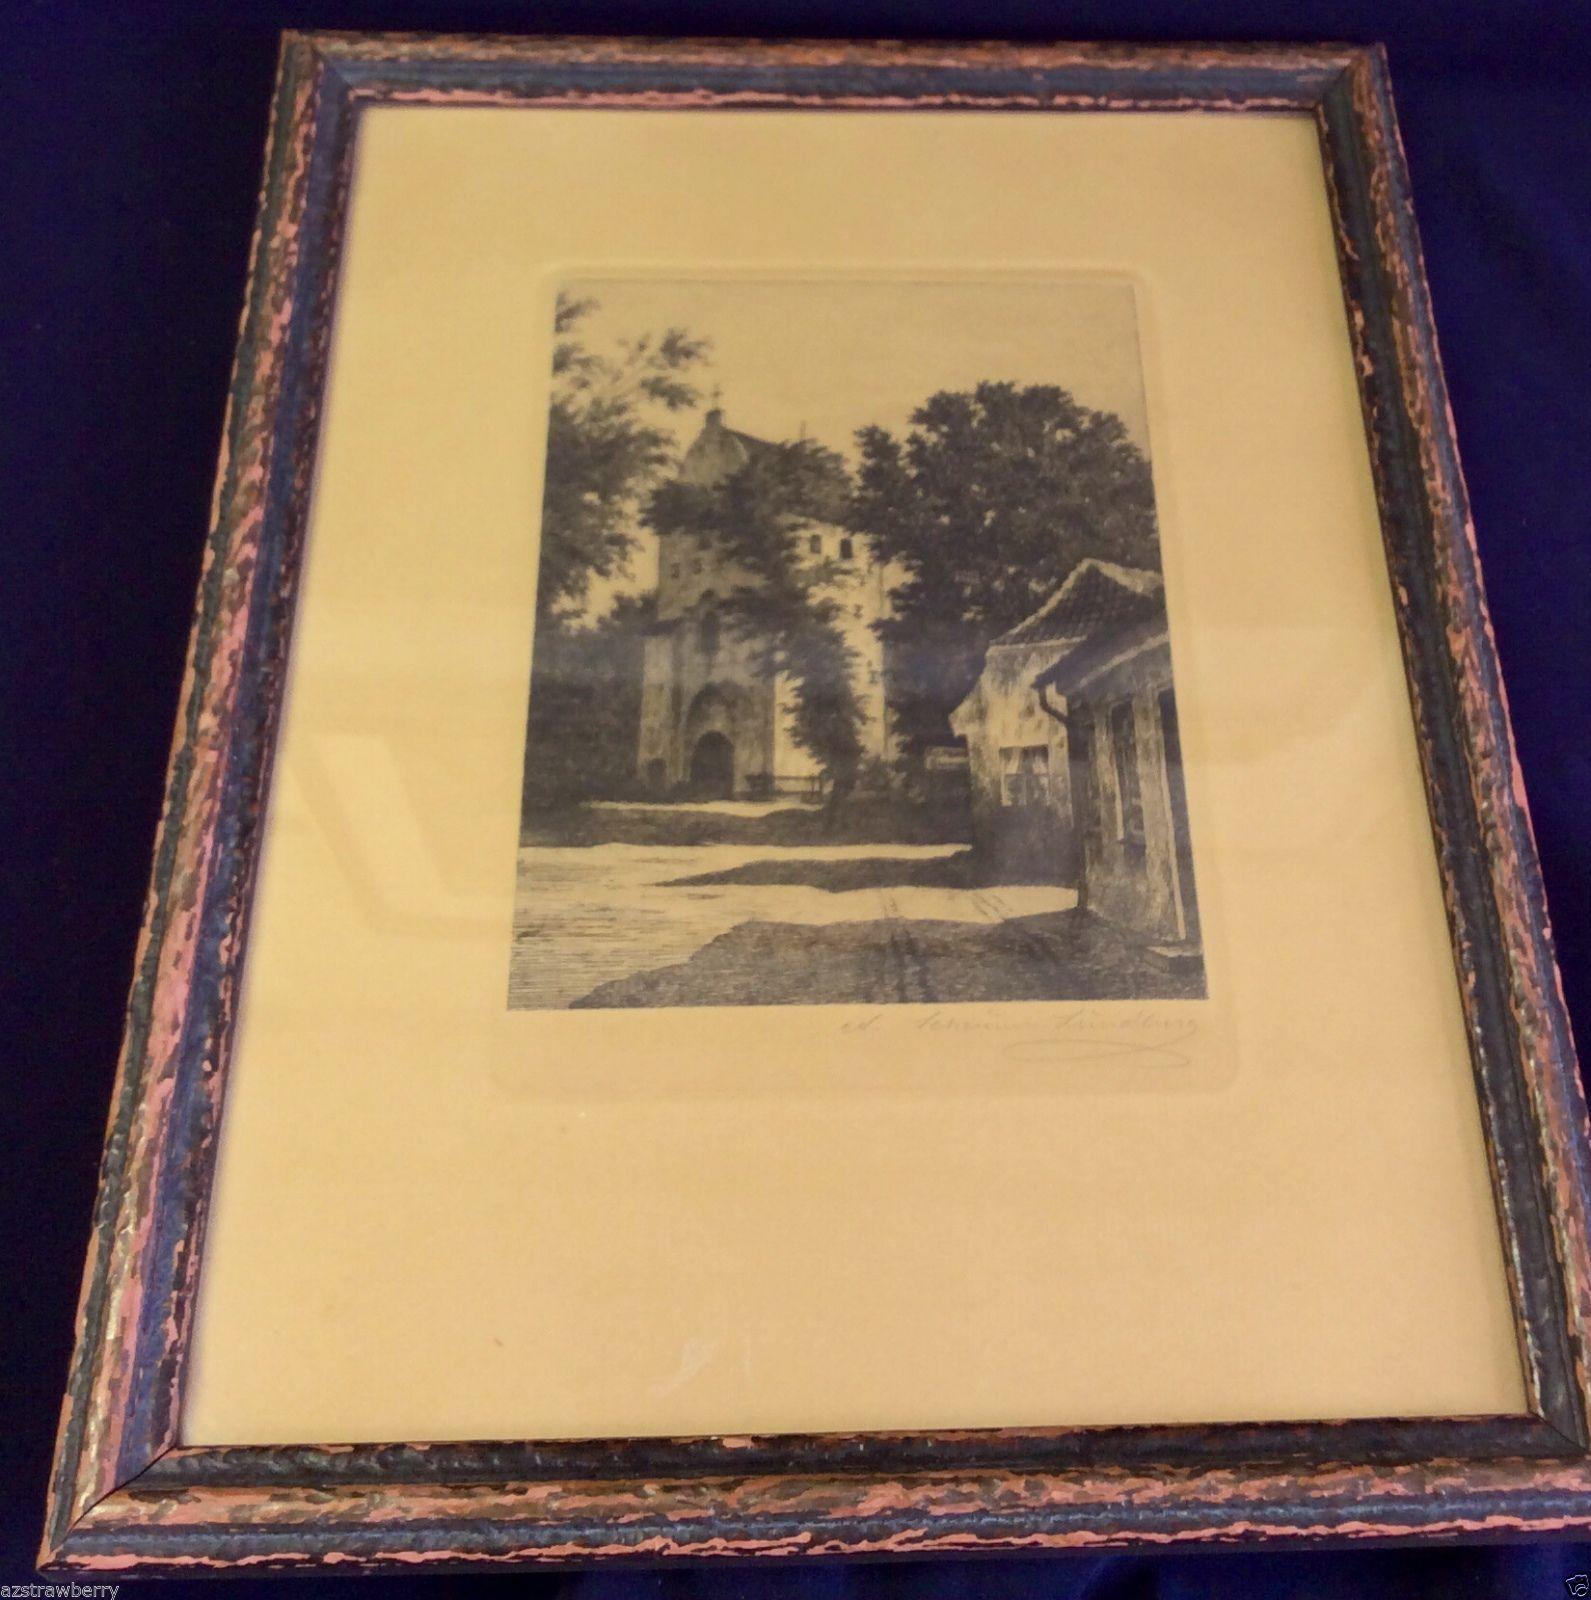 Vtg Antique Village Street Church Signed Print Framed Picture Wall